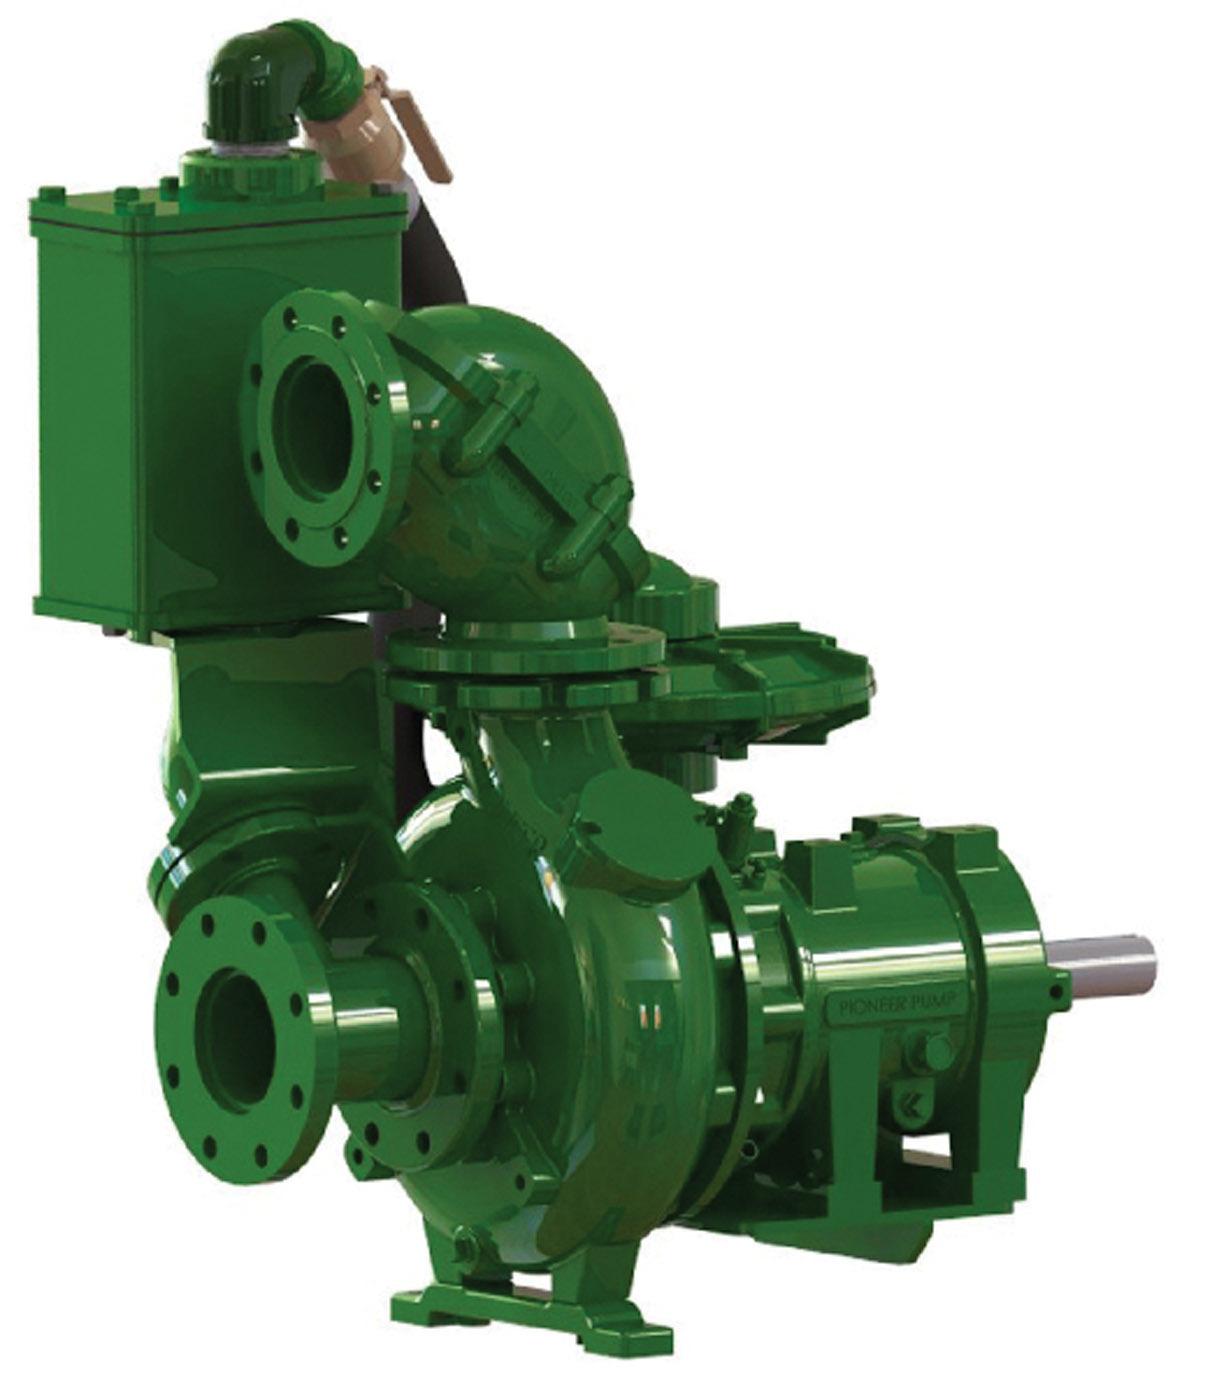 Pioneer Pump Vortex Series pumps from Franklin Electric